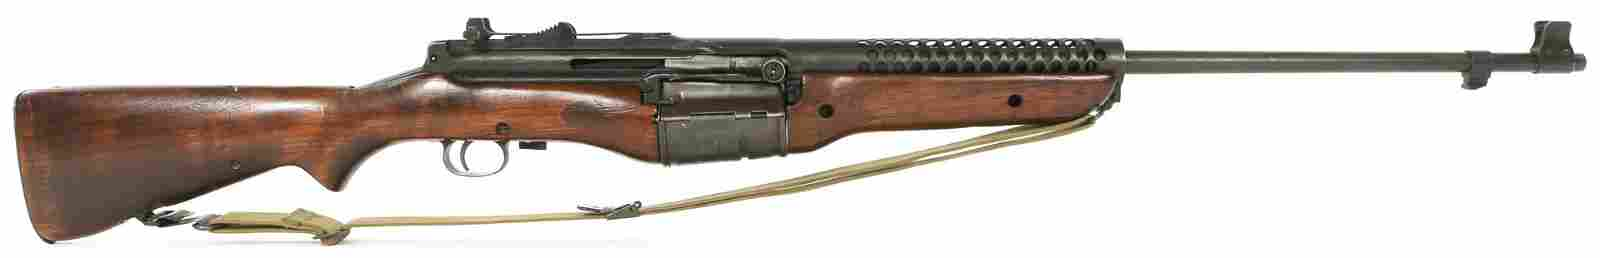 REPUBLIC AIRCRAFT CRANSTON ARMS M1941 JOHNSON